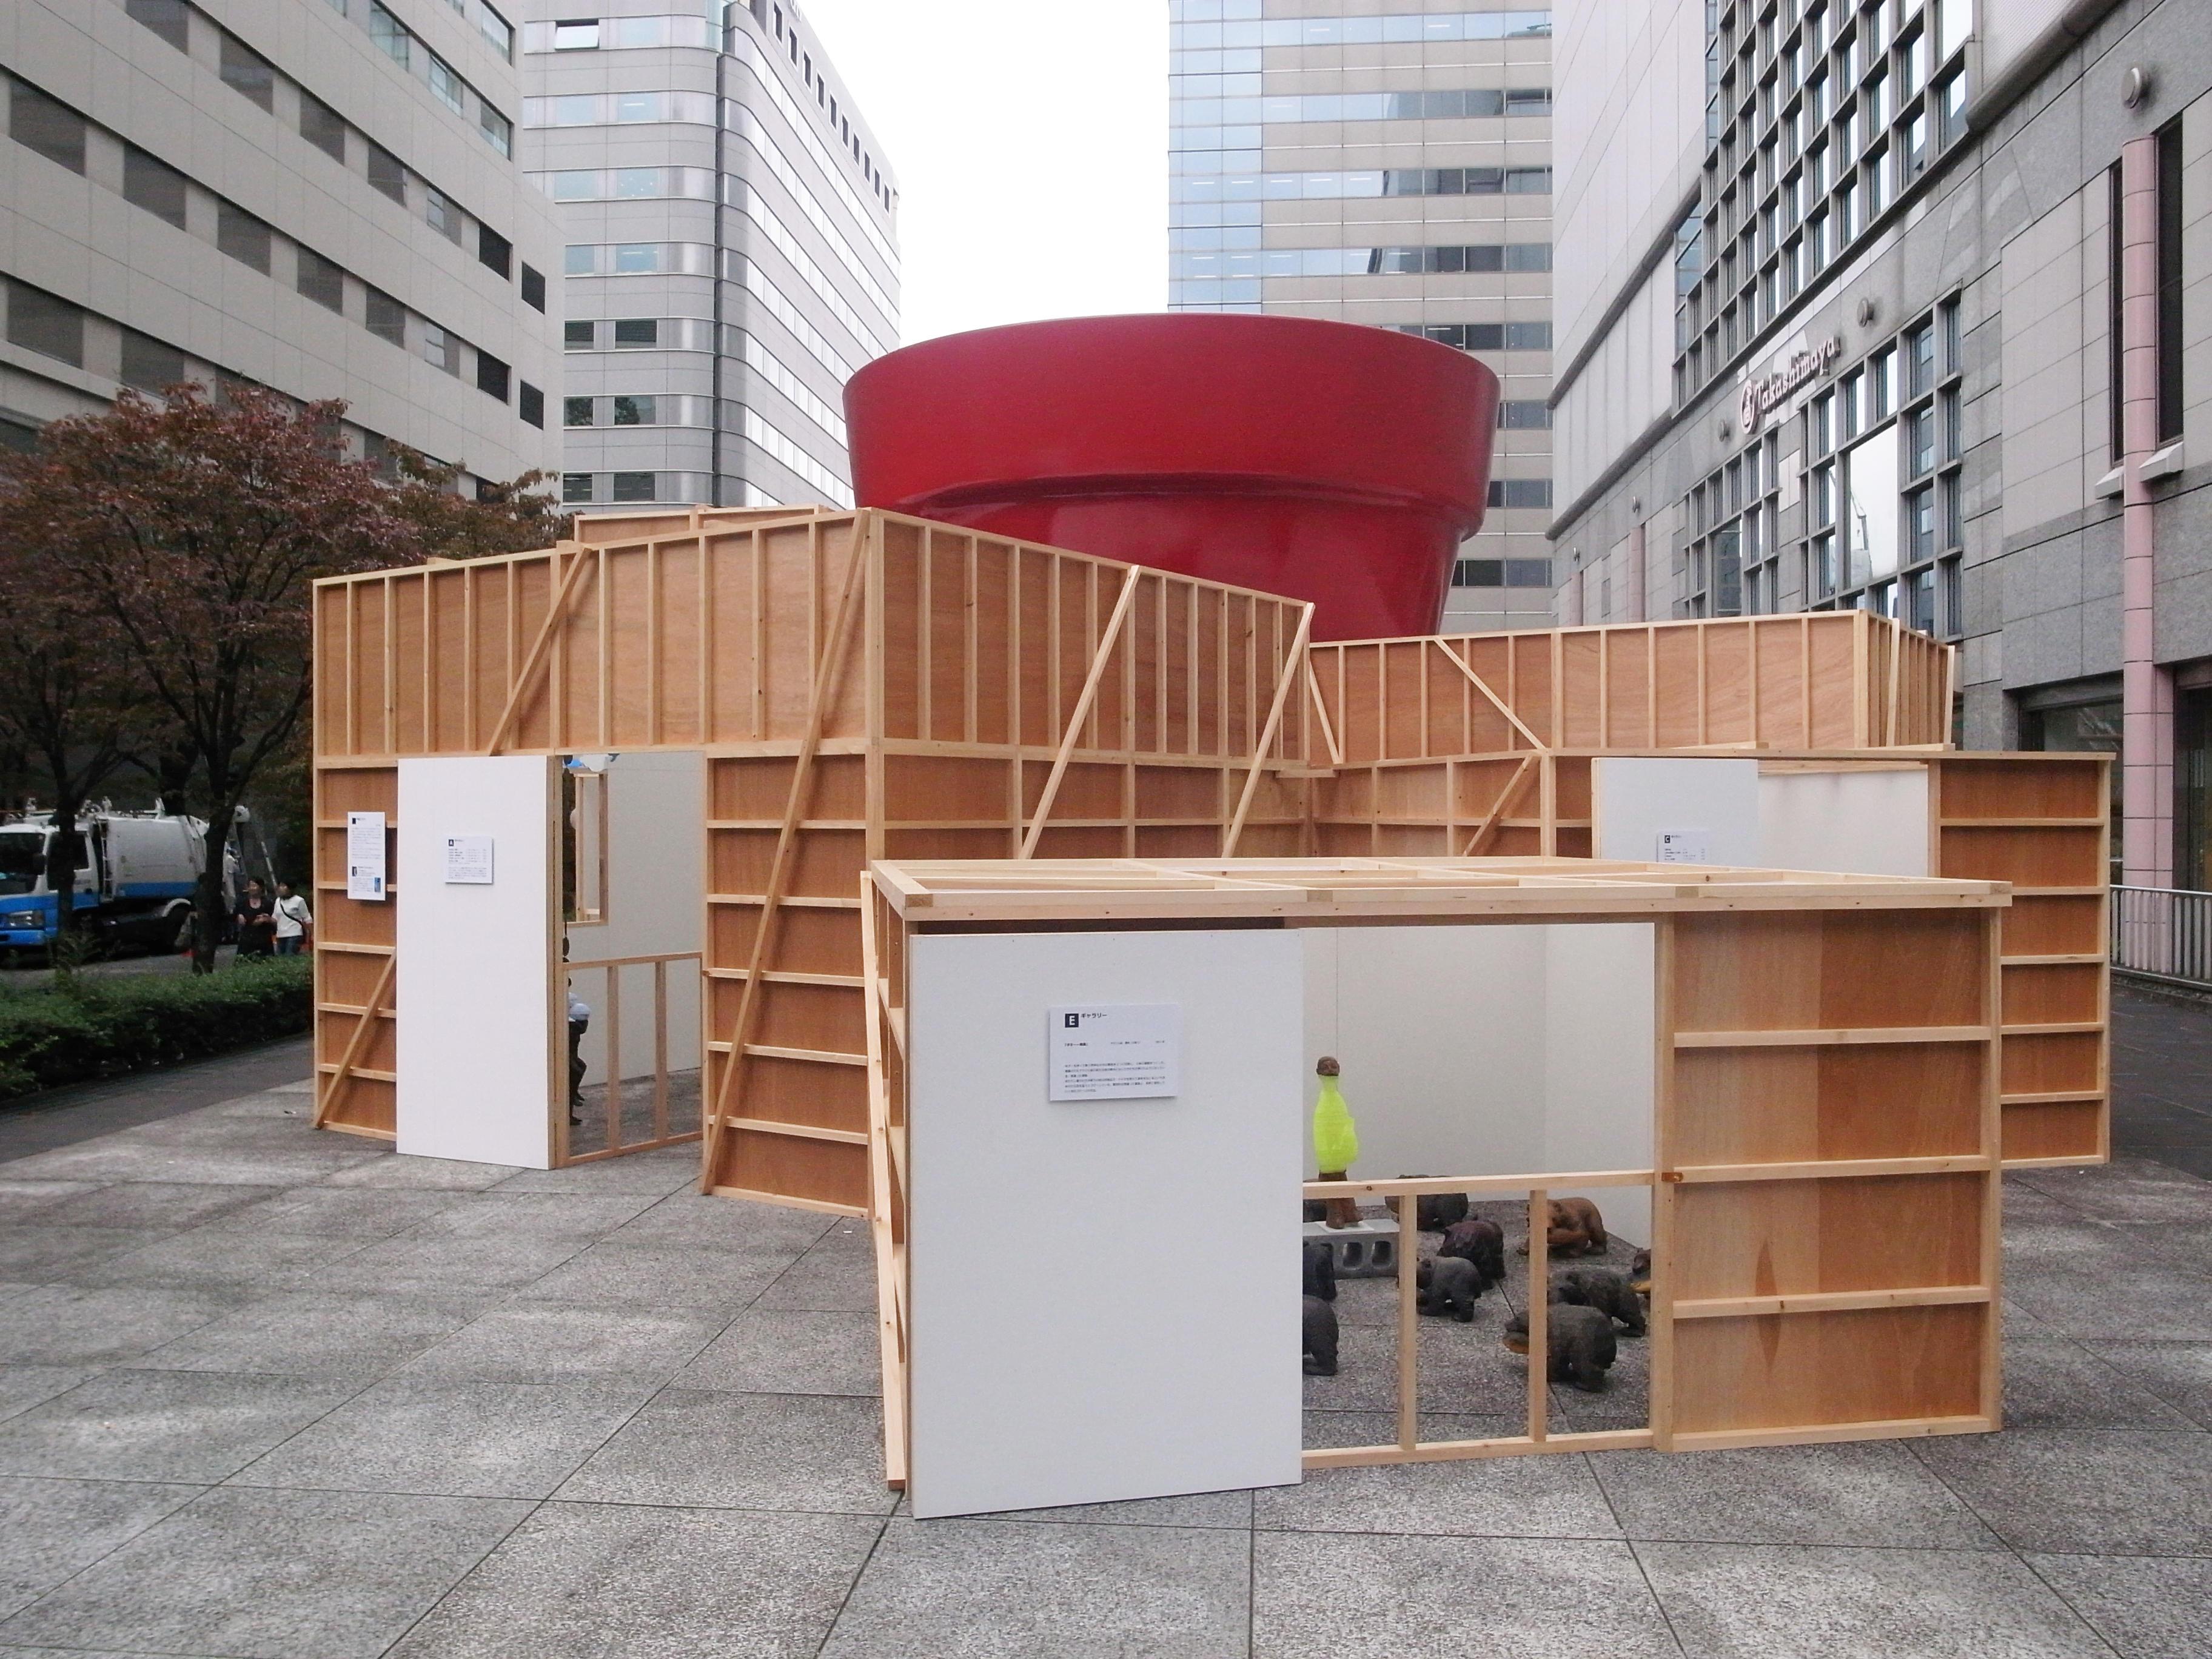 Kyotaro Hakamata special installation for 1 week at FARET Tachikawa Art